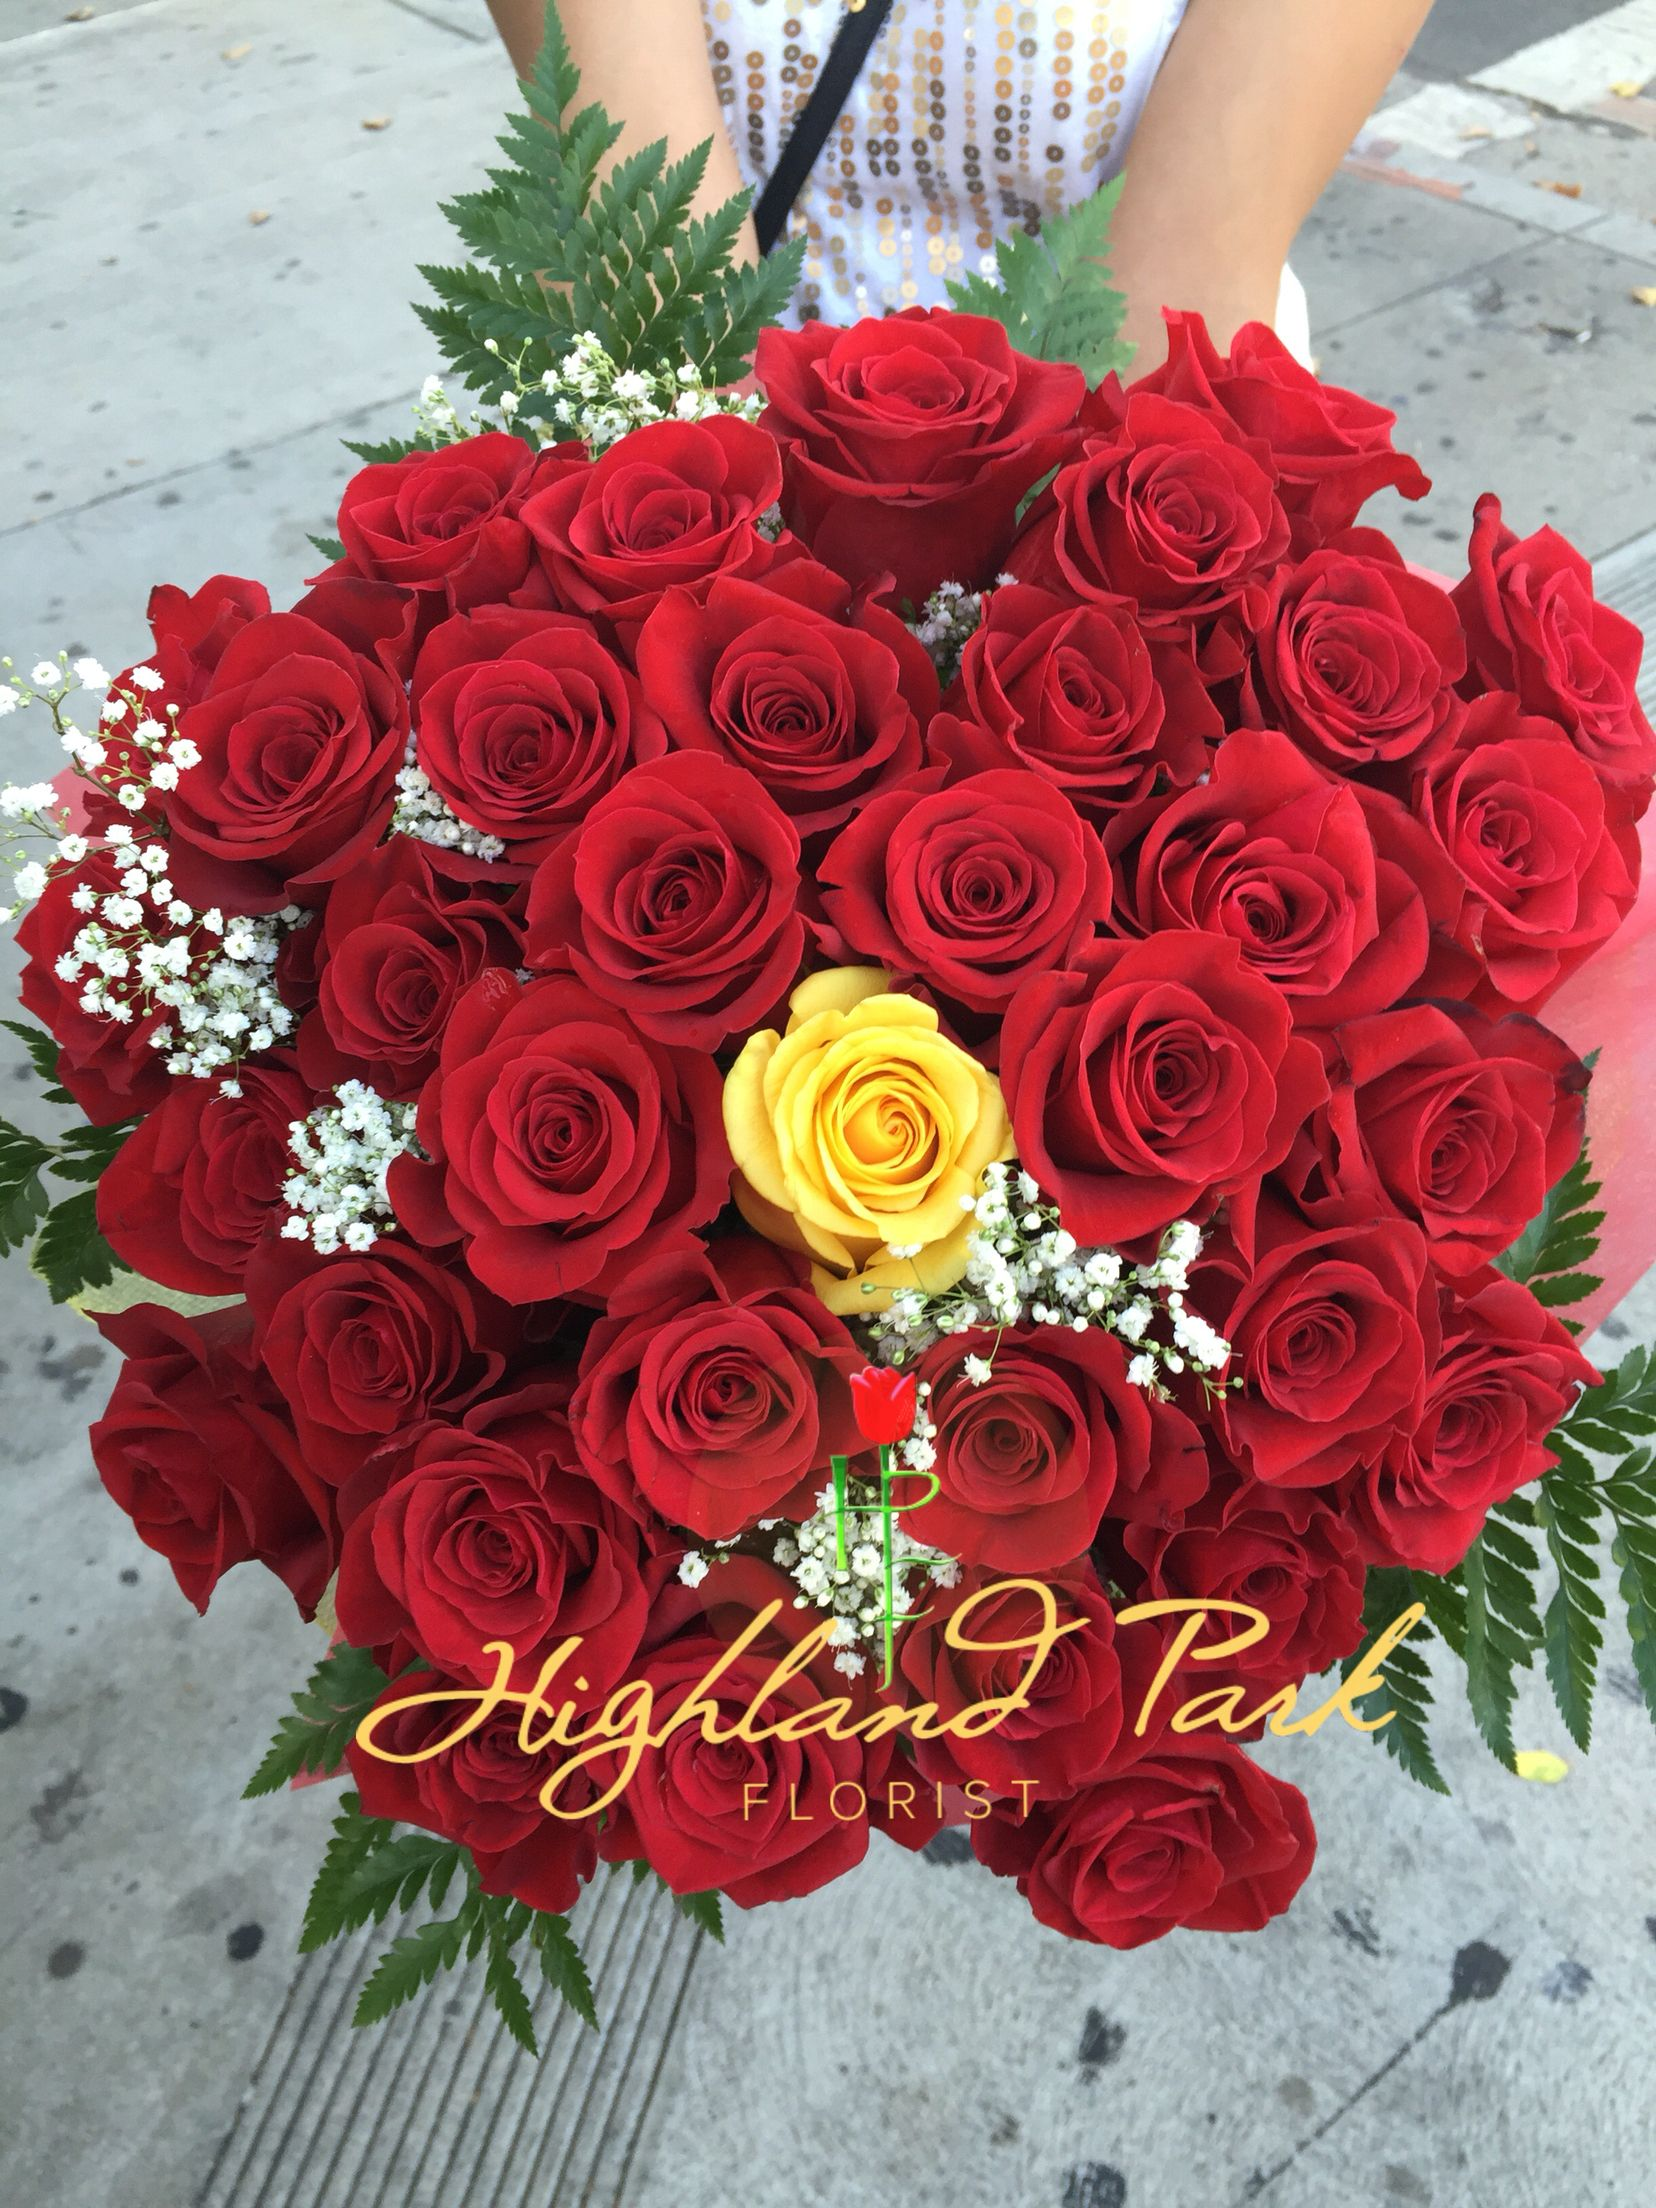 Custom 3 Dozen Rose Bouquet Made Here At Our Florist Wedding